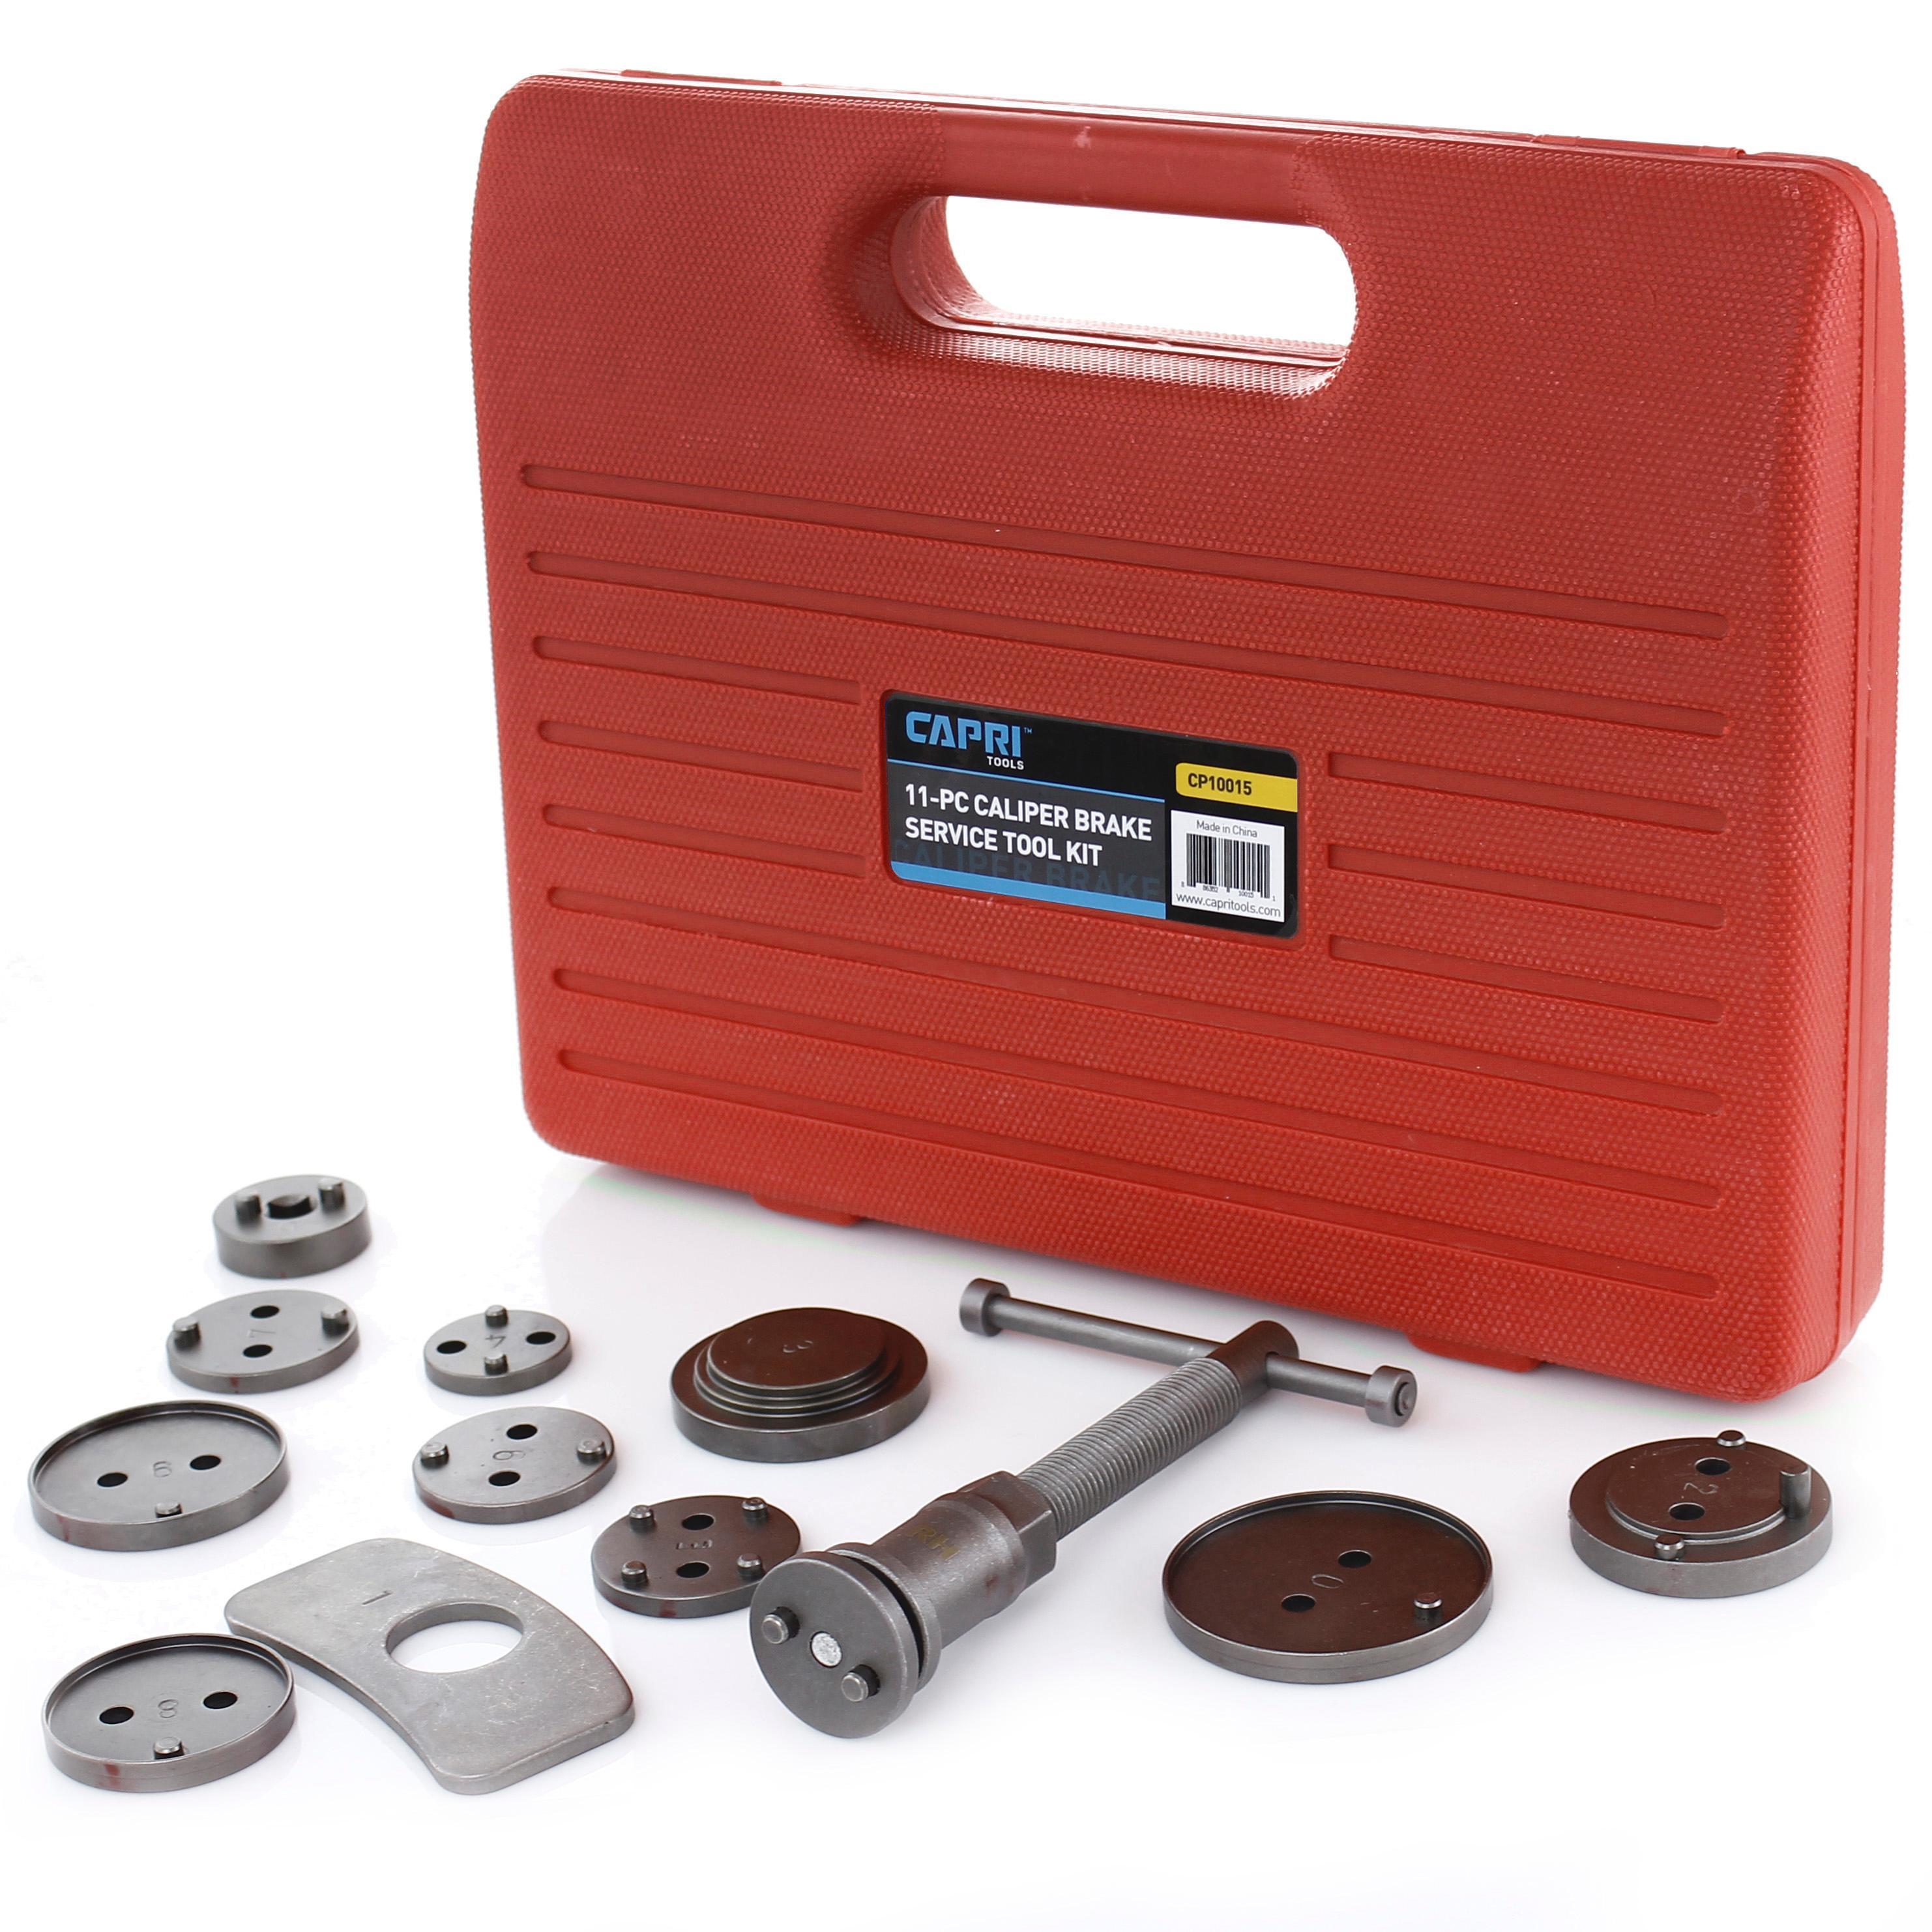 Brake Caliper Retraction Tool Capri Tools Brake Caliper Kit